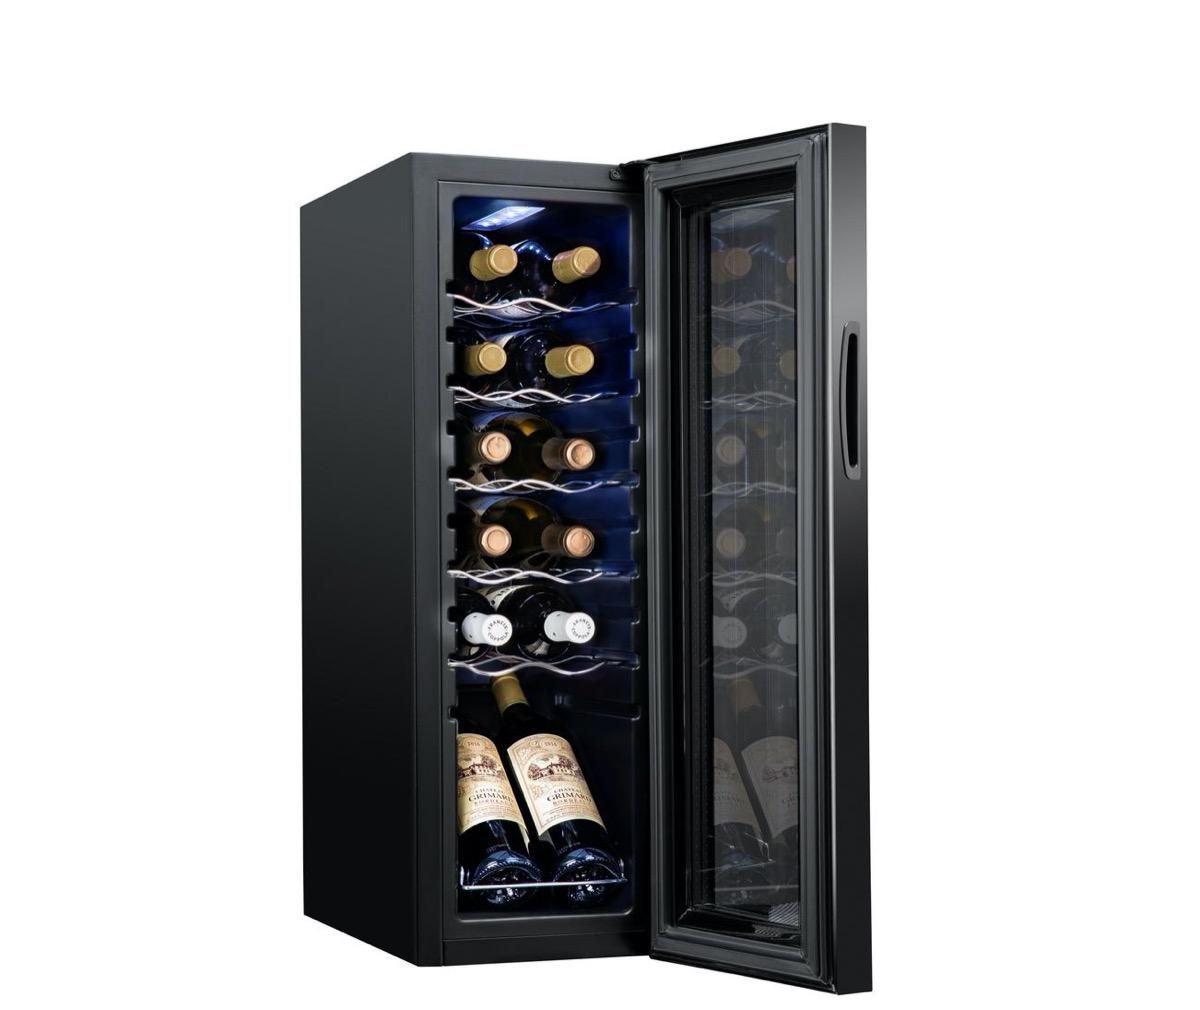 12-bottle black wine bottle mini fridge with door open